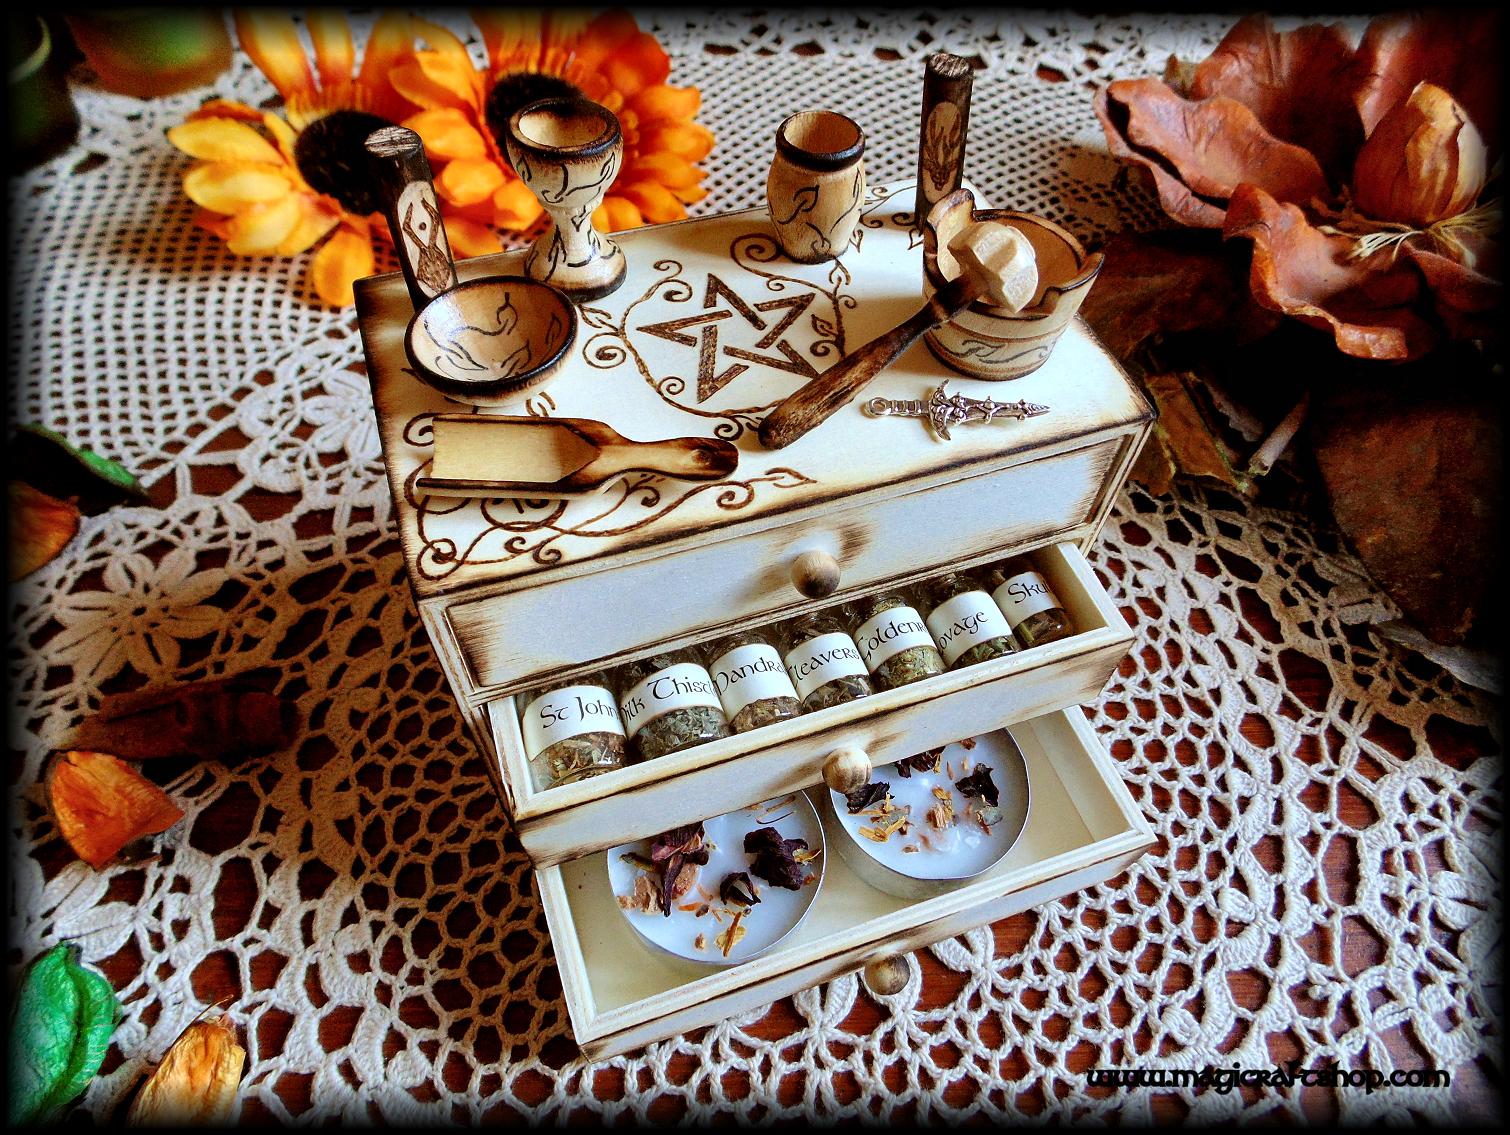 Wicca altar set